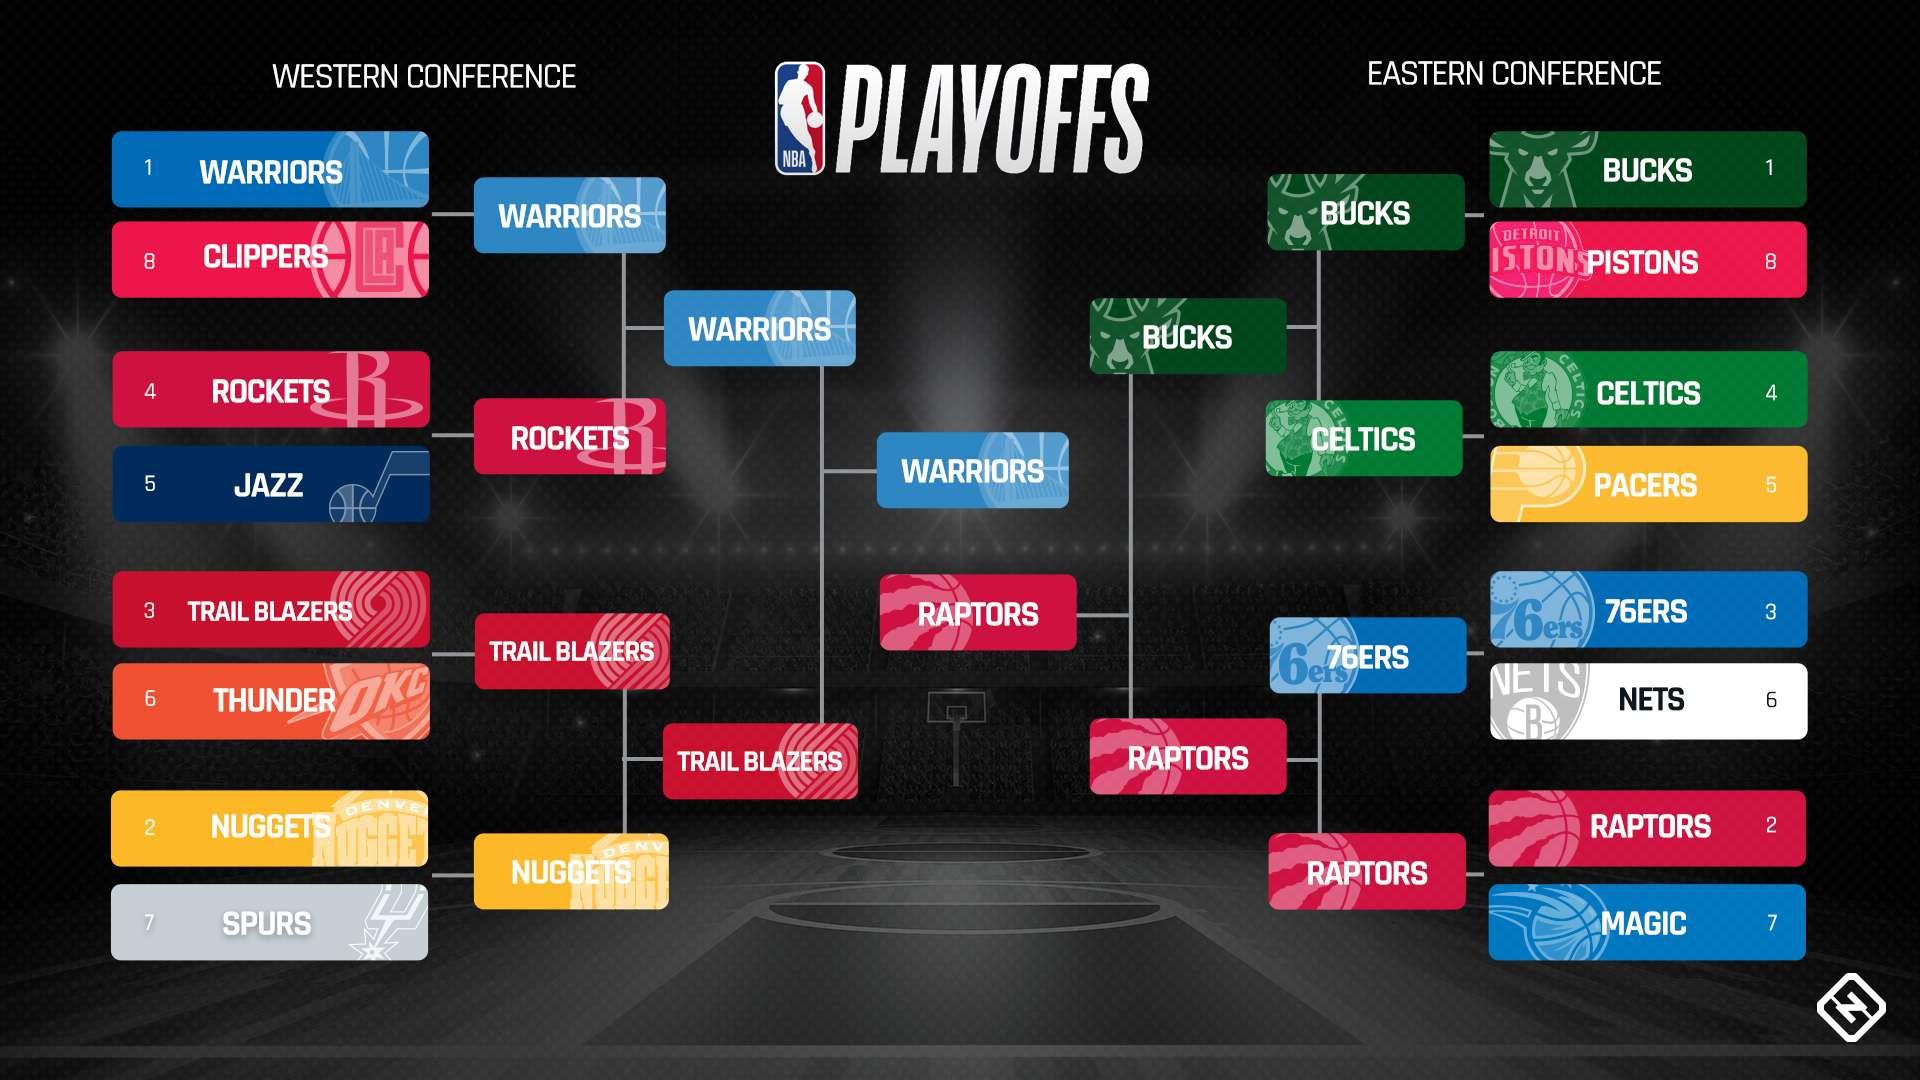 Nba Finals Schedule 2019 NBA playoffs schedule 2019: Full bracket, dates, times, TV